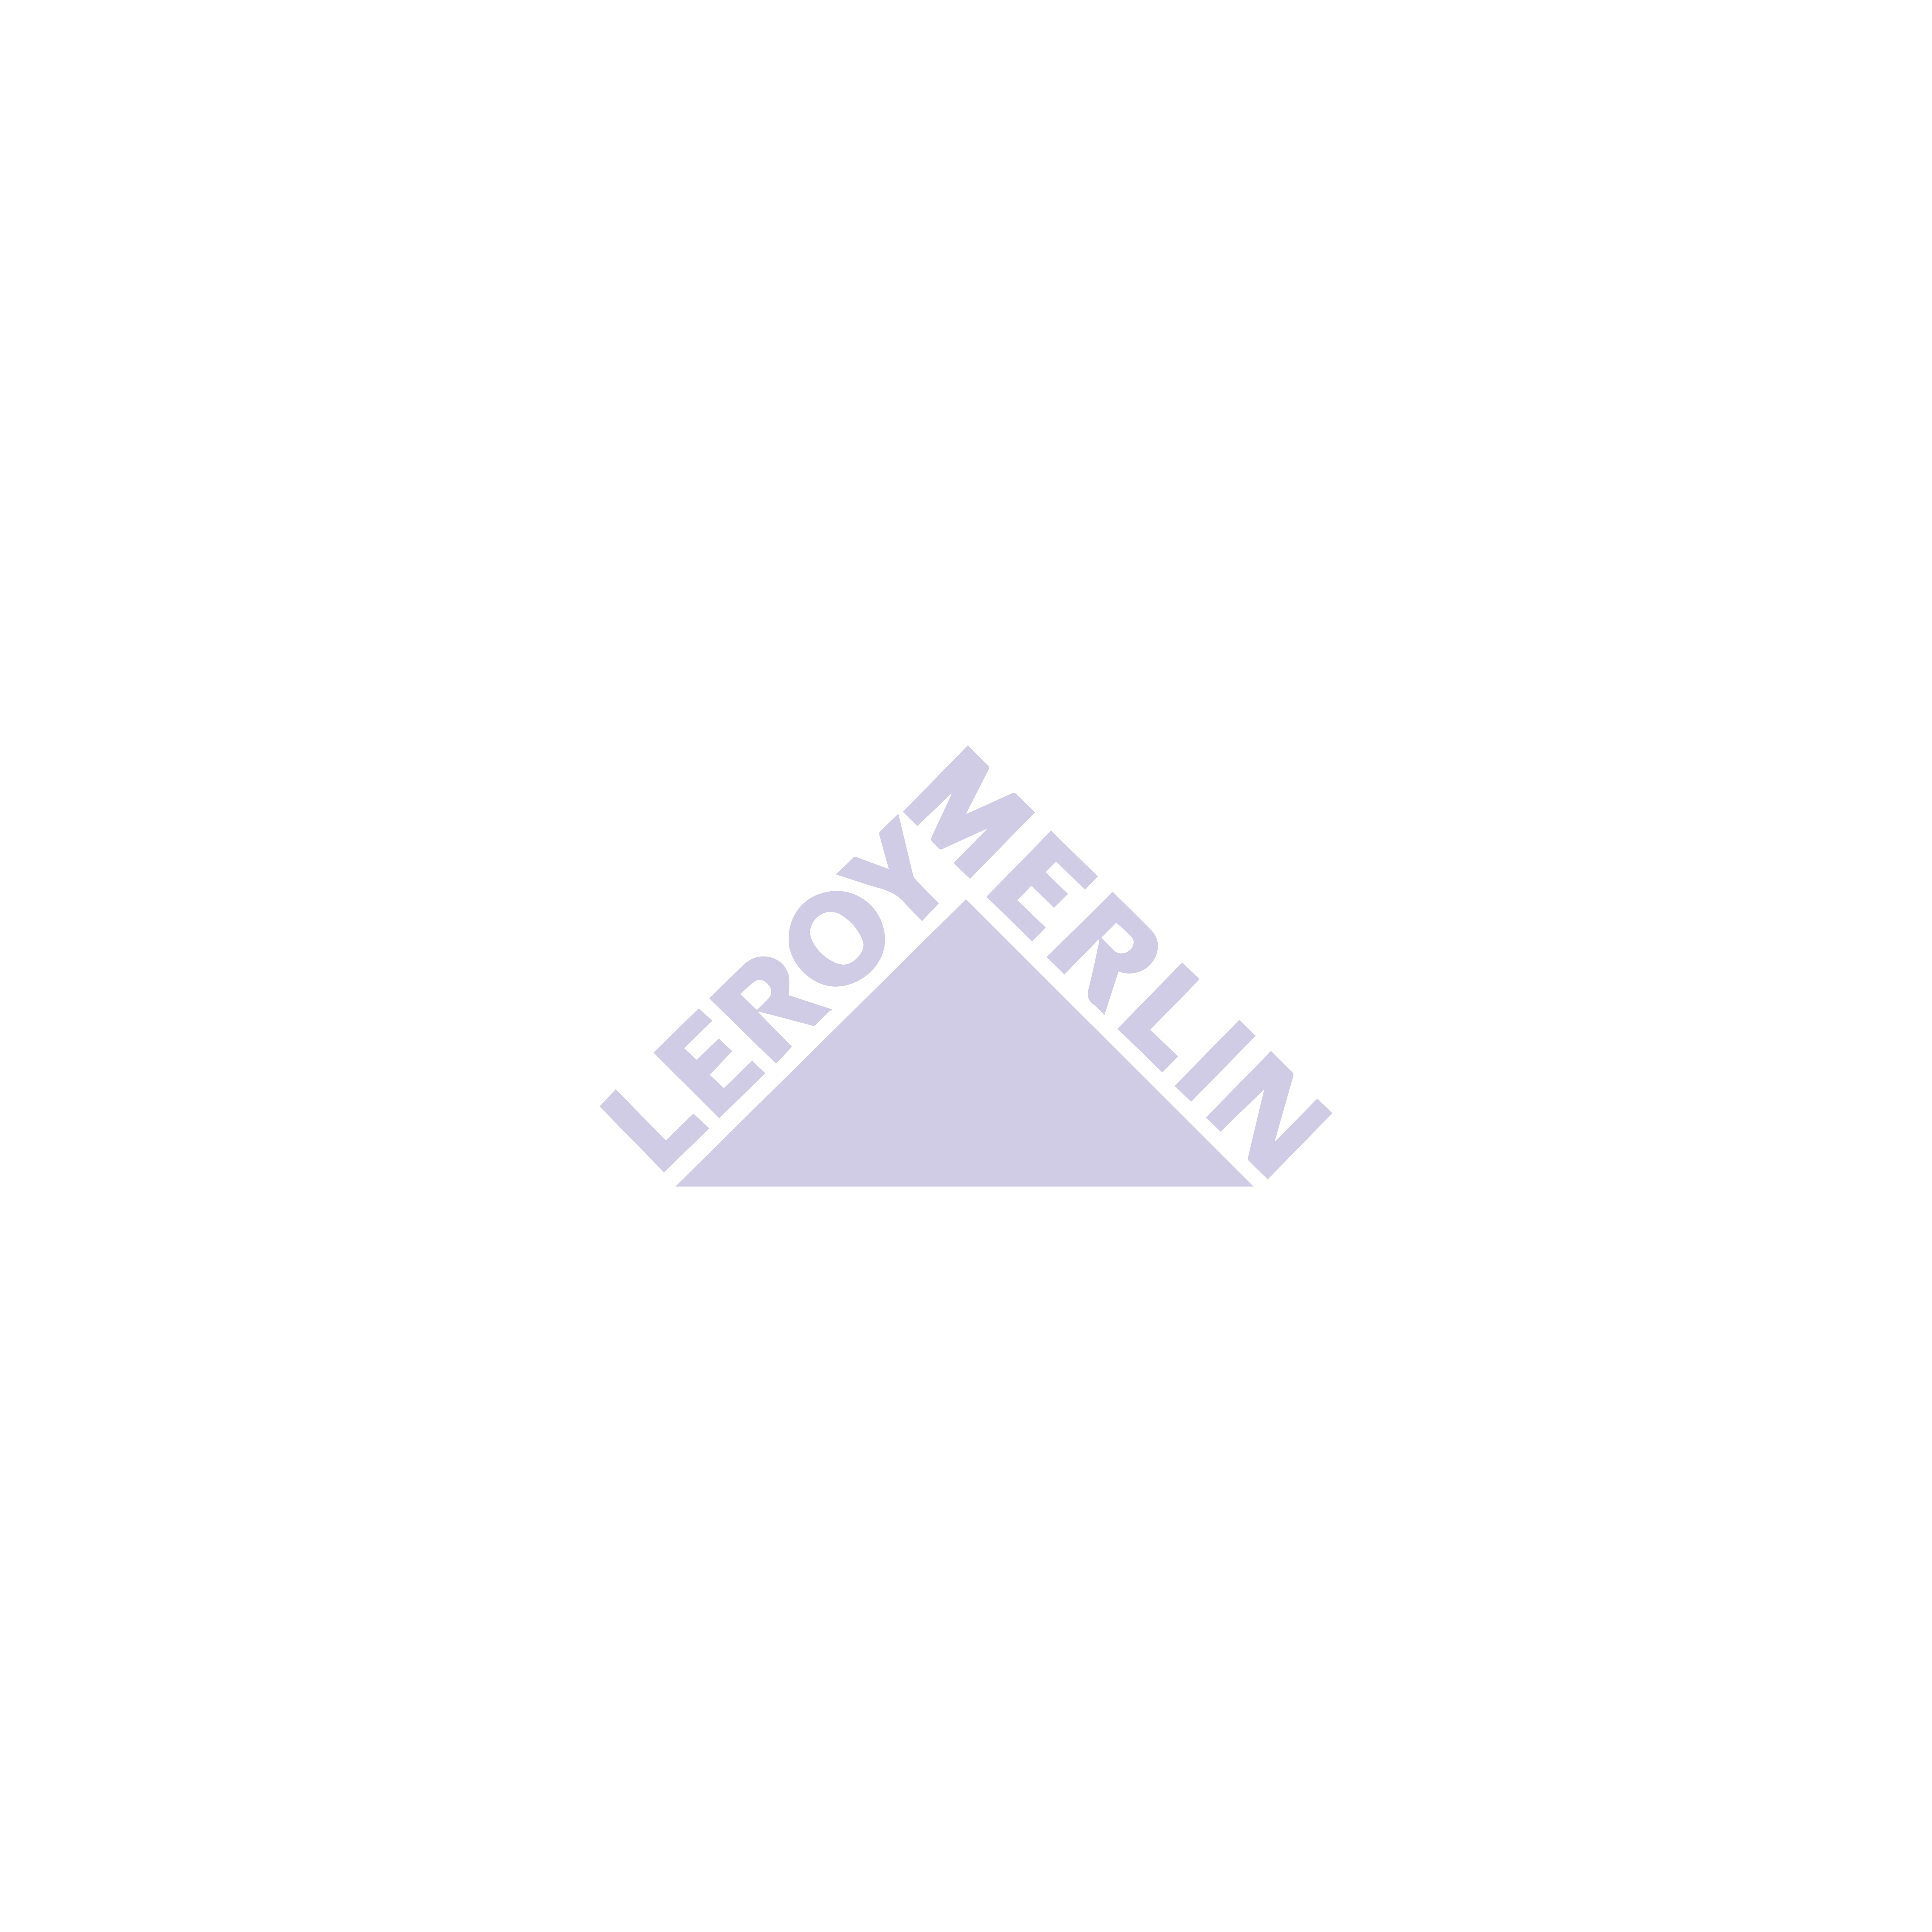 leroy merlin planable customer logo